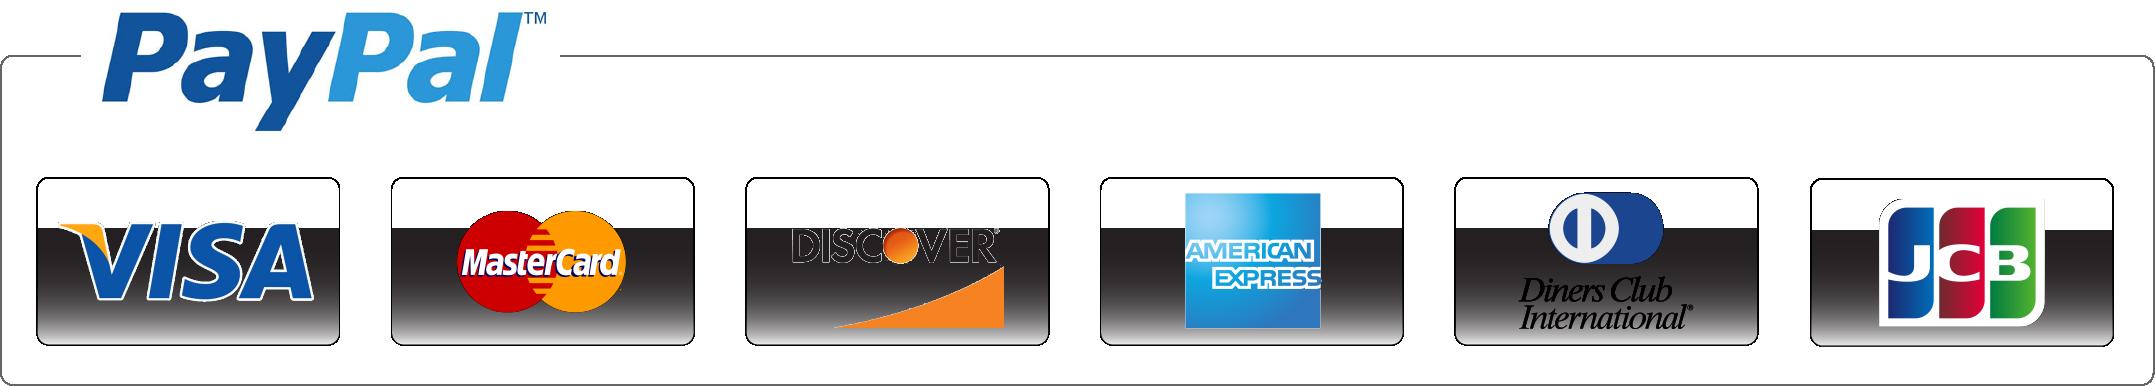 Billedresultat for Visa, Mastercard, American Express, Discover, Diners Club, JCB